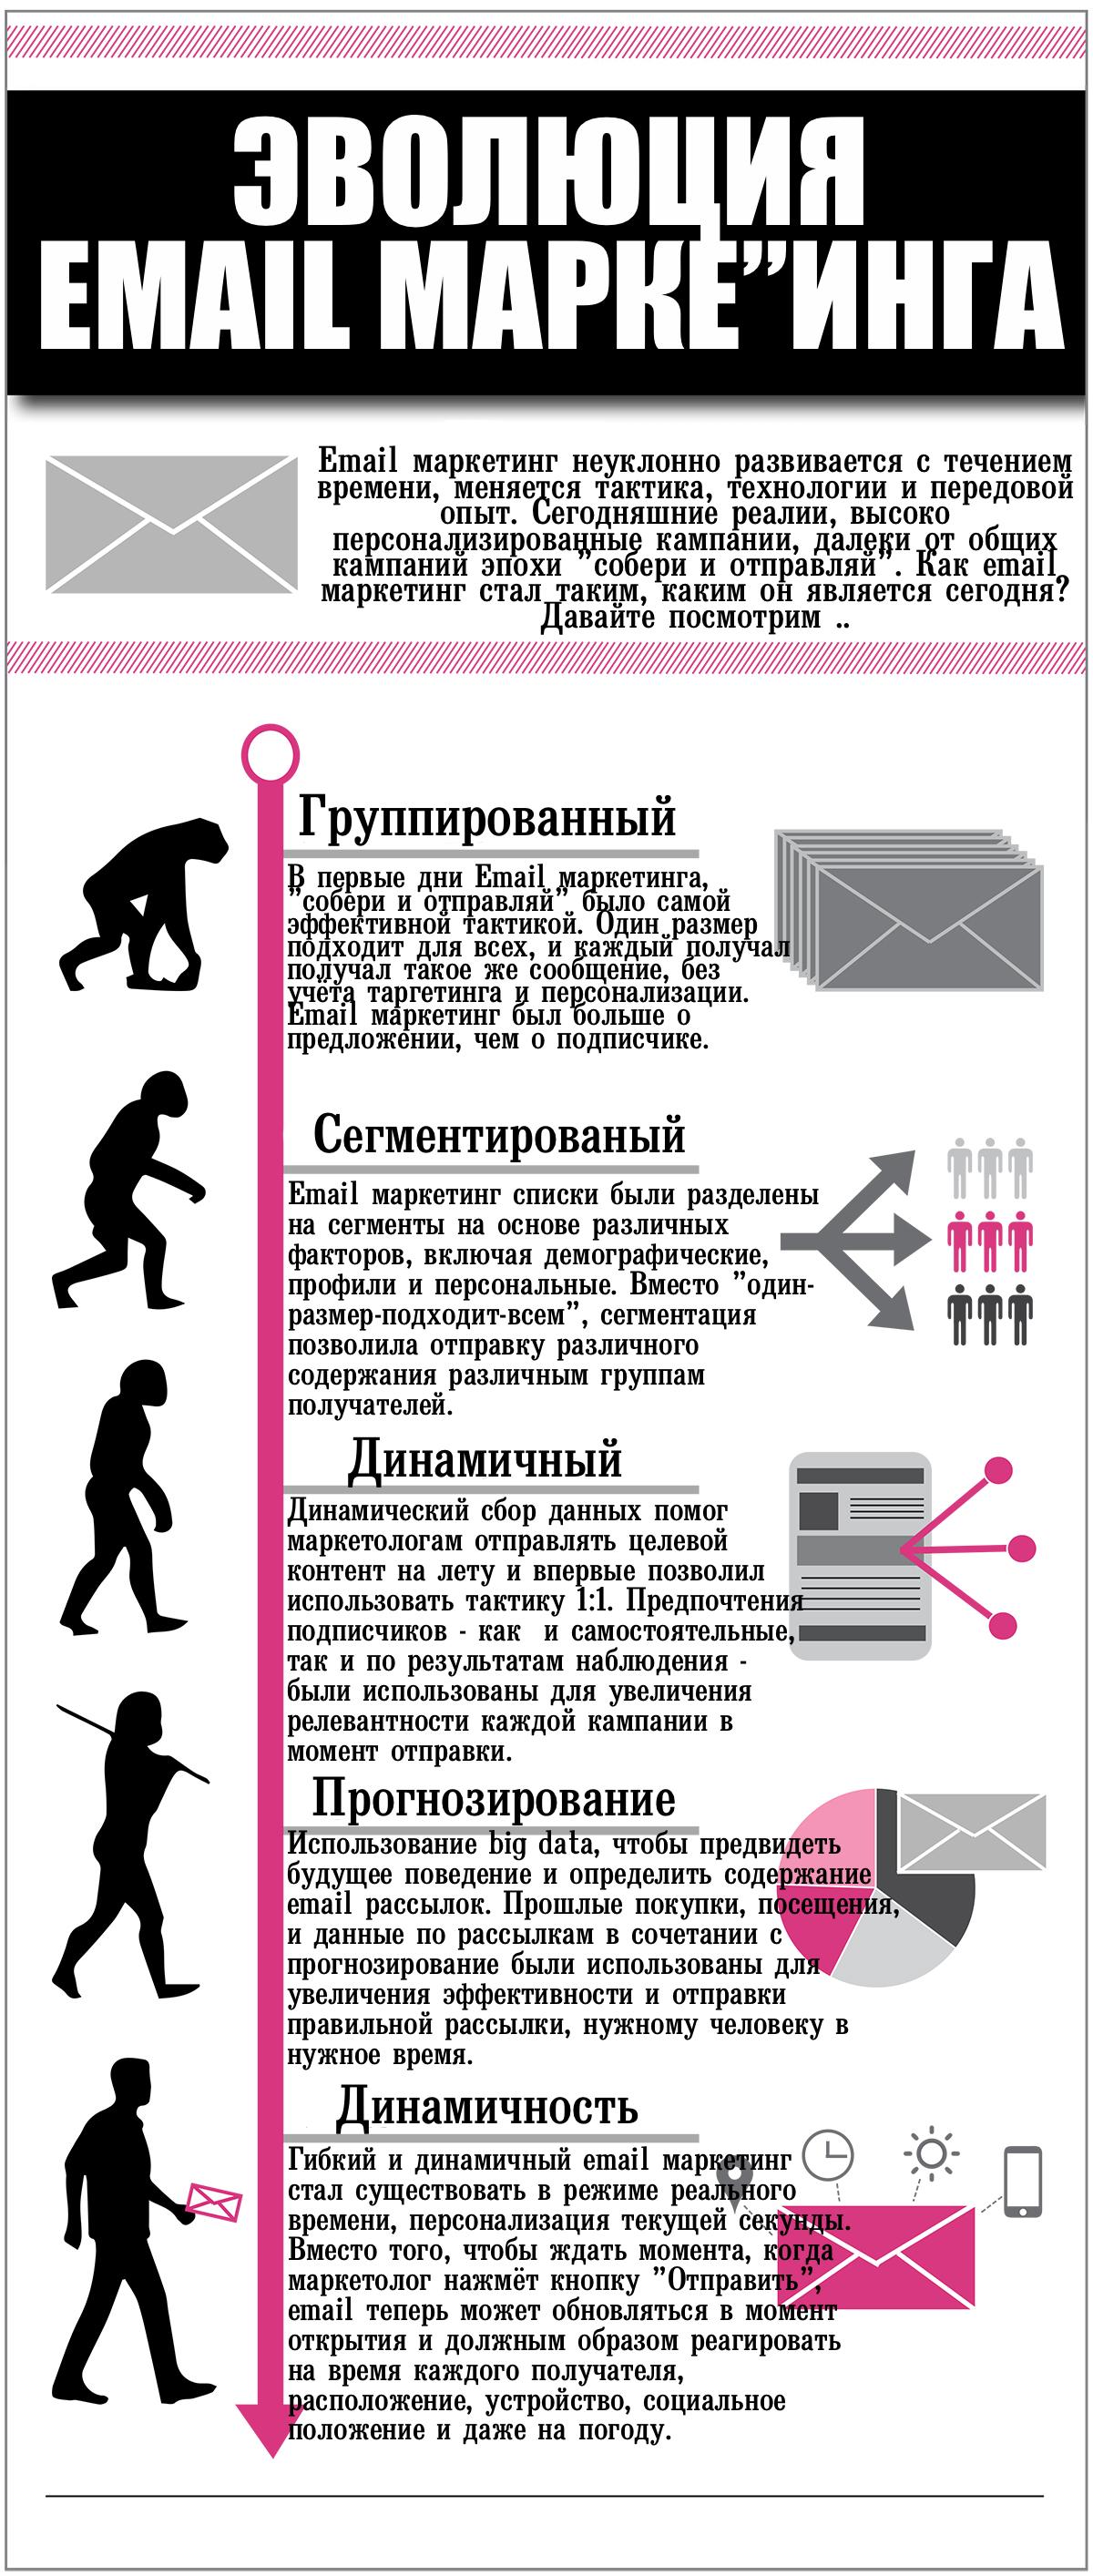 Инфографика:Эволюция Email маркетинга